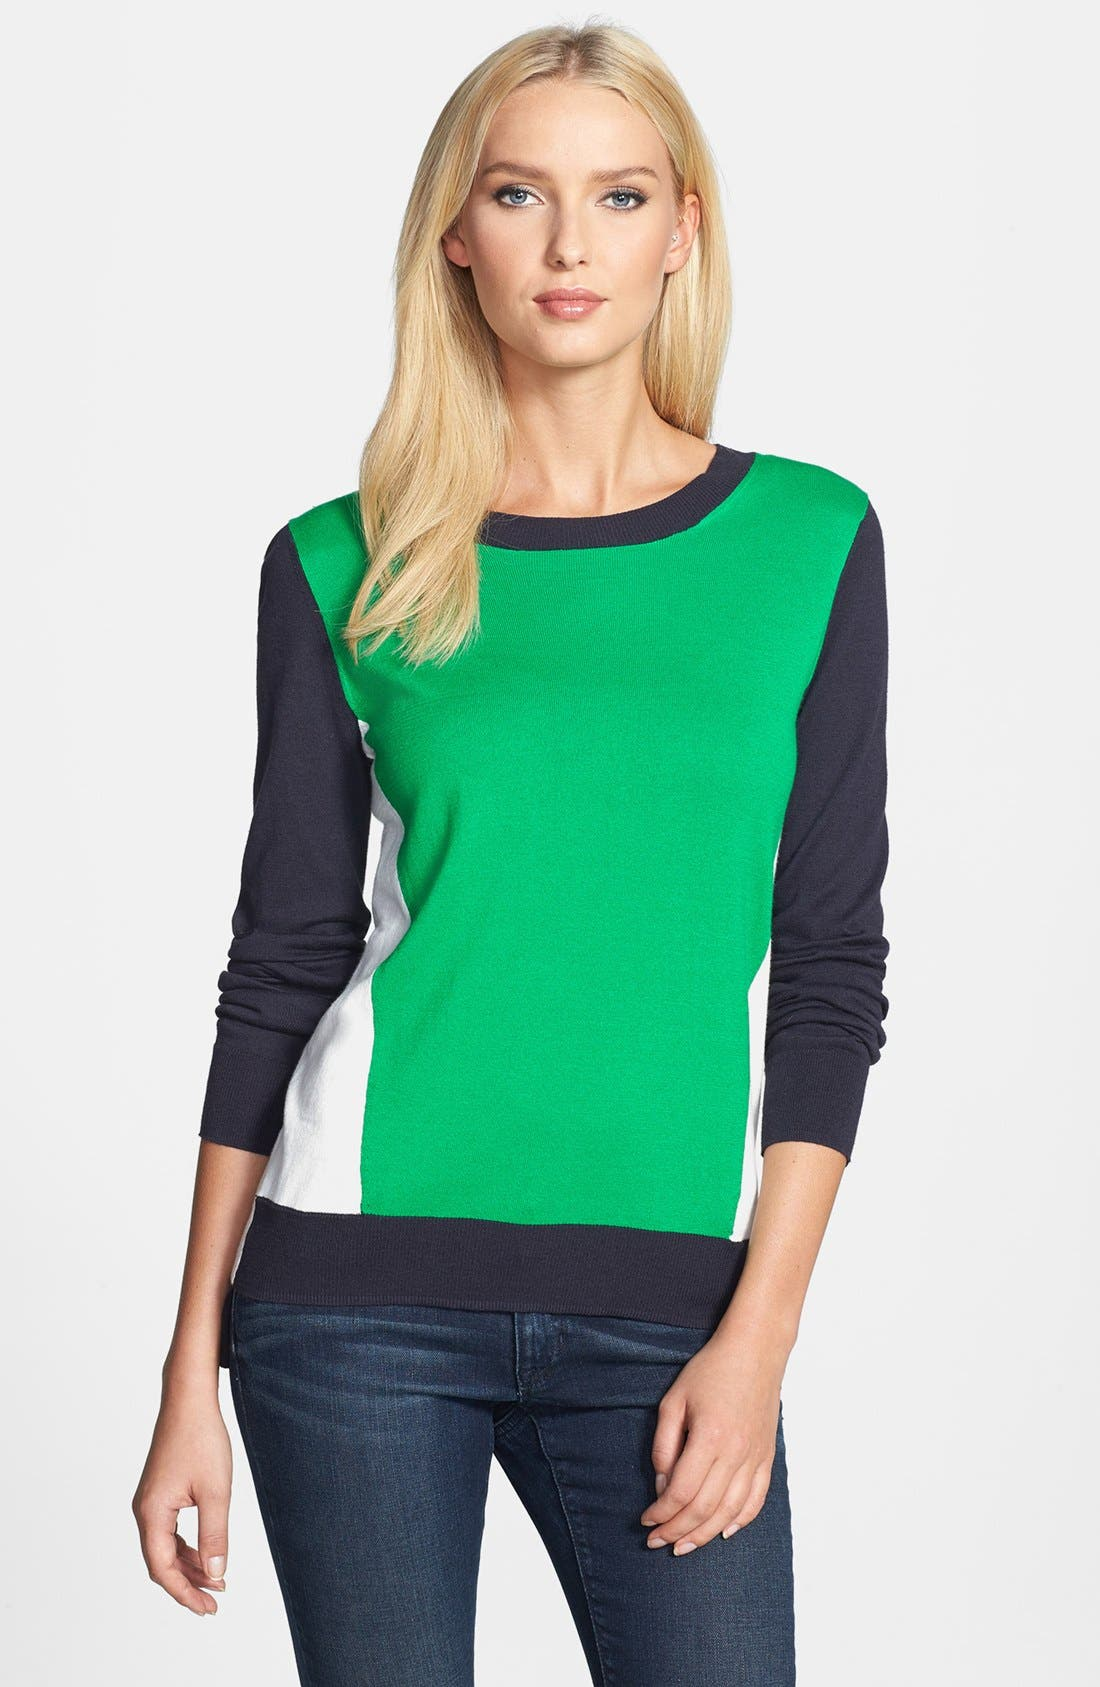 Main Image - MICHAEL Michael Kors Colorblock Cotton Blend Crewneck Sweater